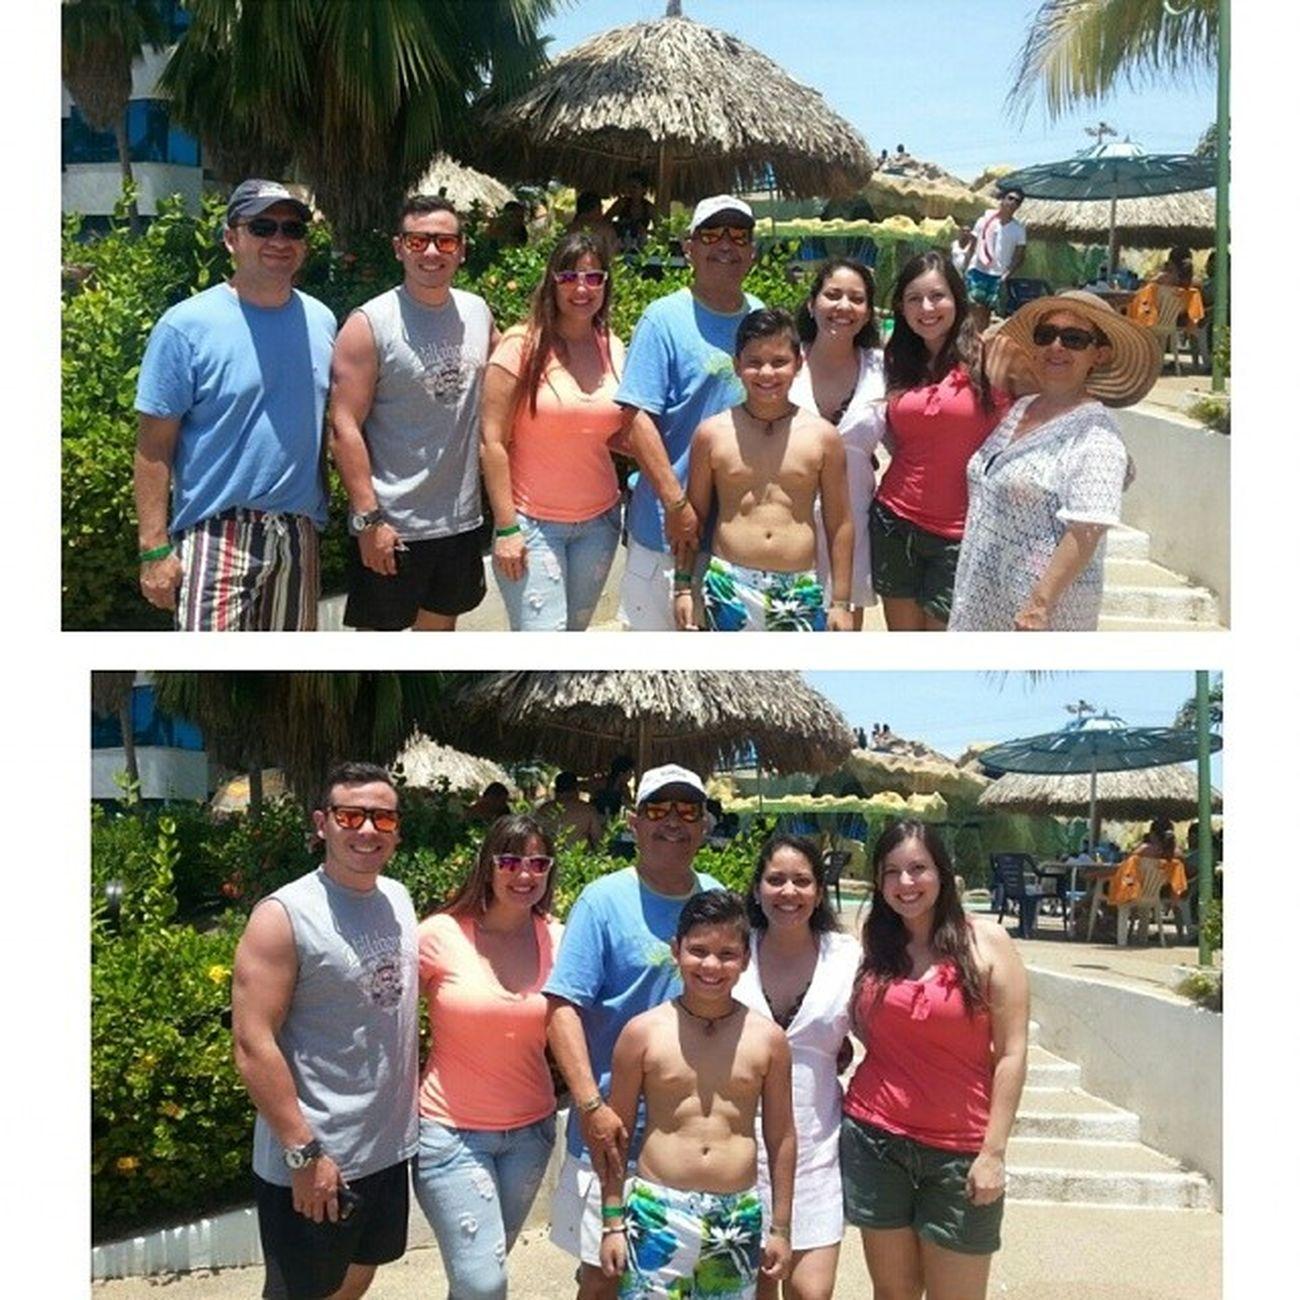 Hermanas Família . La familia casi completa. @victorjarias01